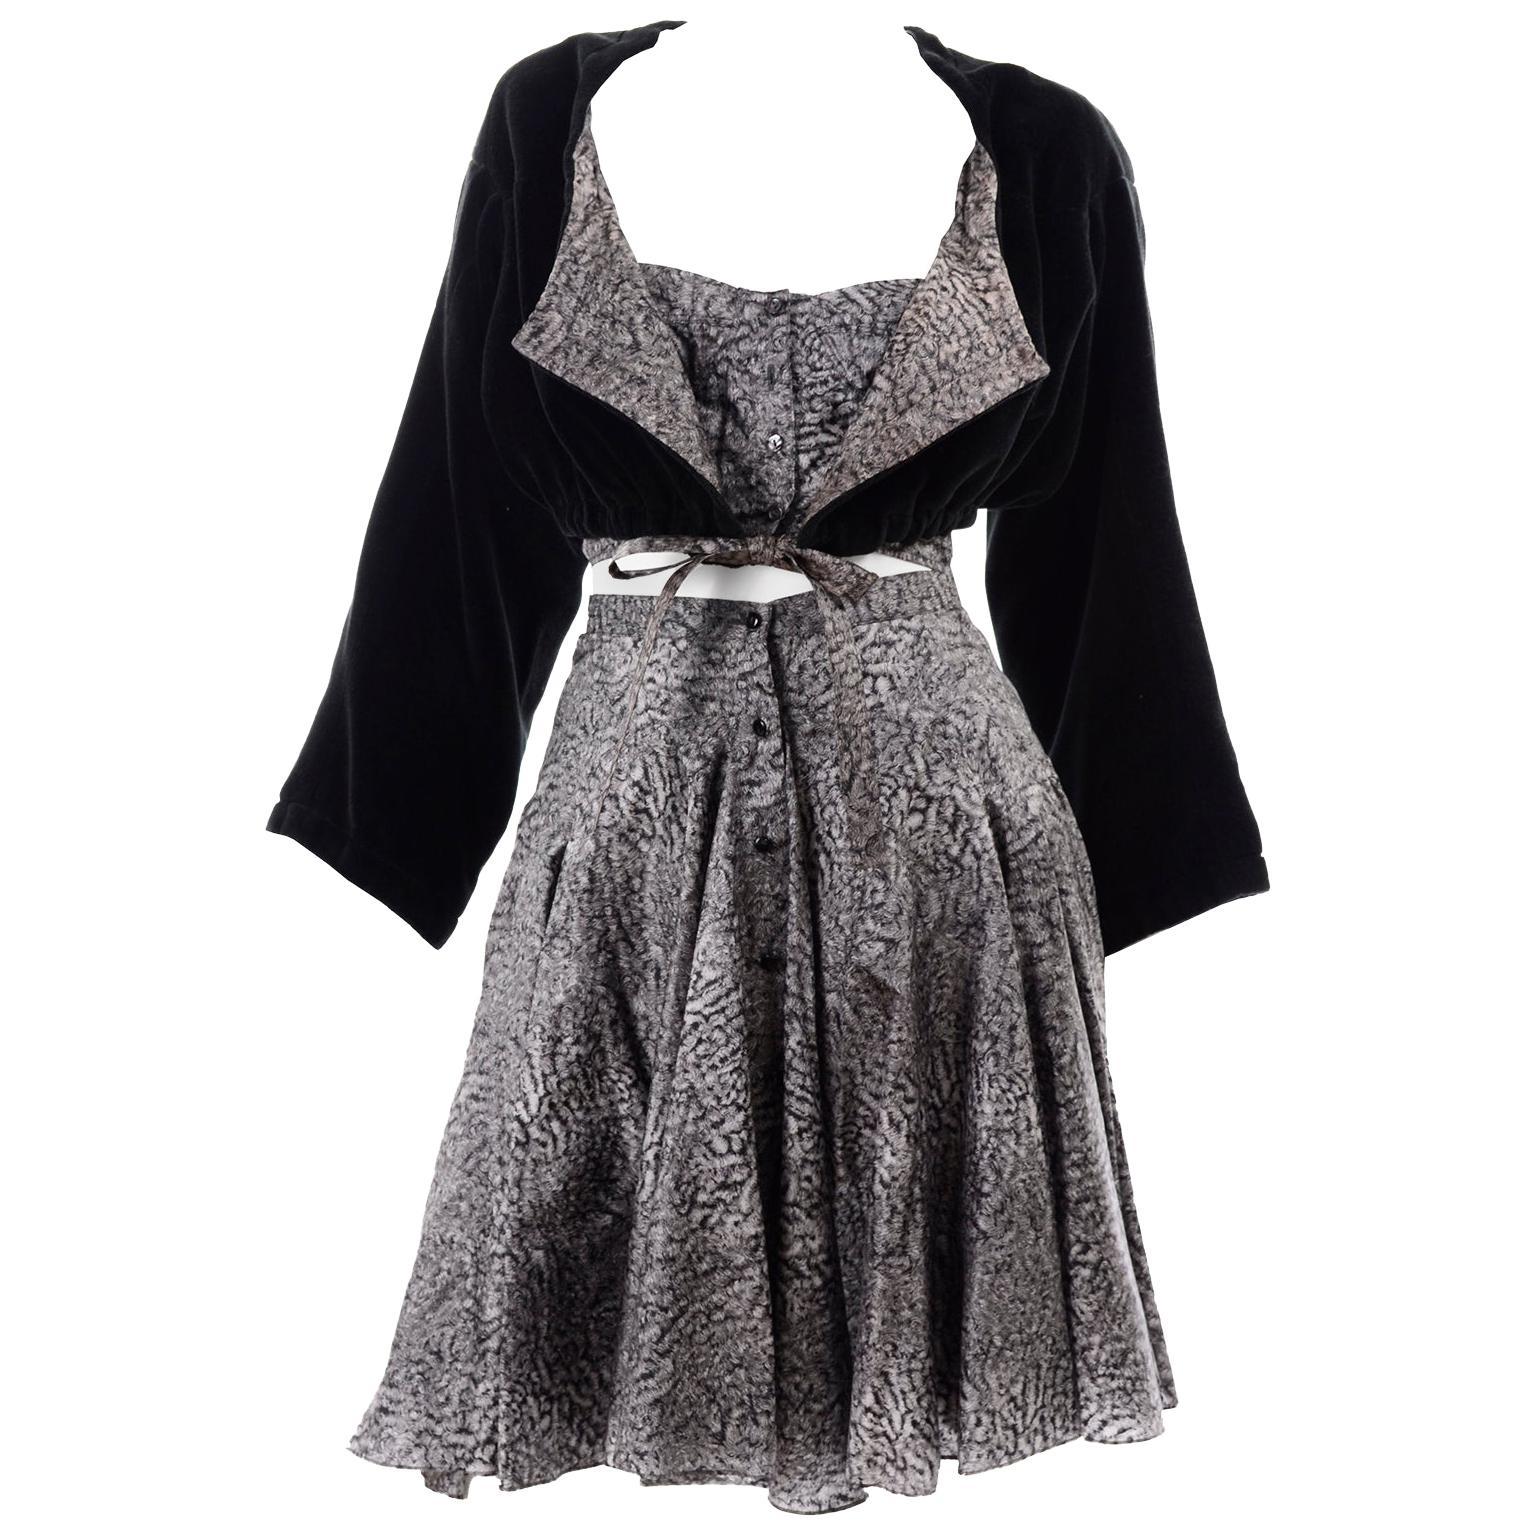 Rare Azzedine Alaia 4 Pc Shorts Skirt Bustier Jacket Christophe Von Weyhe Print